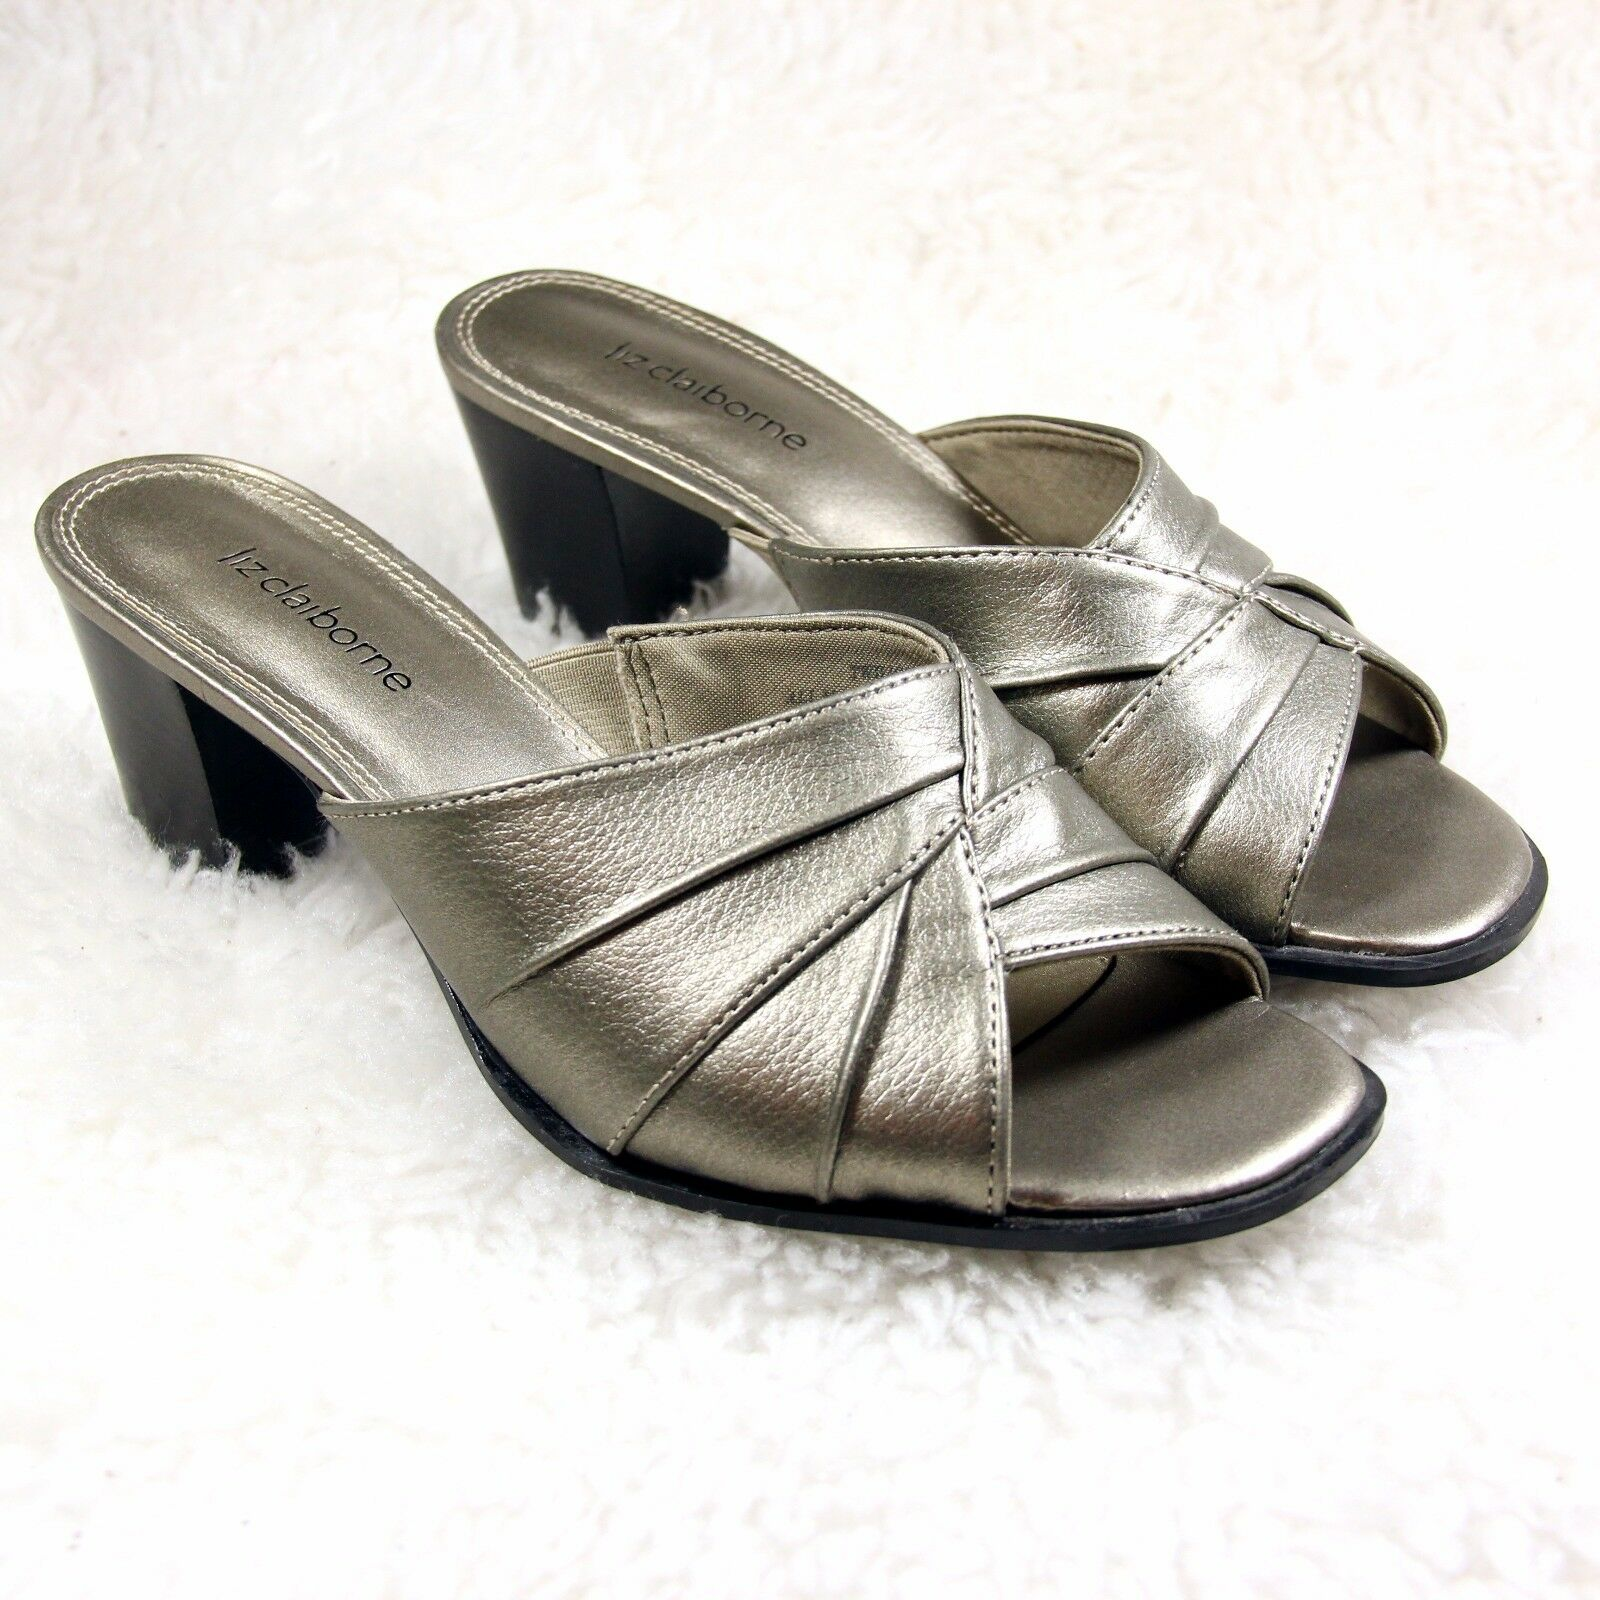 Liz Claiborne Twilight Womens Shoes Silver Heels Slip On Open Toe Heels Silver Pumps SZ 6M 4caf67